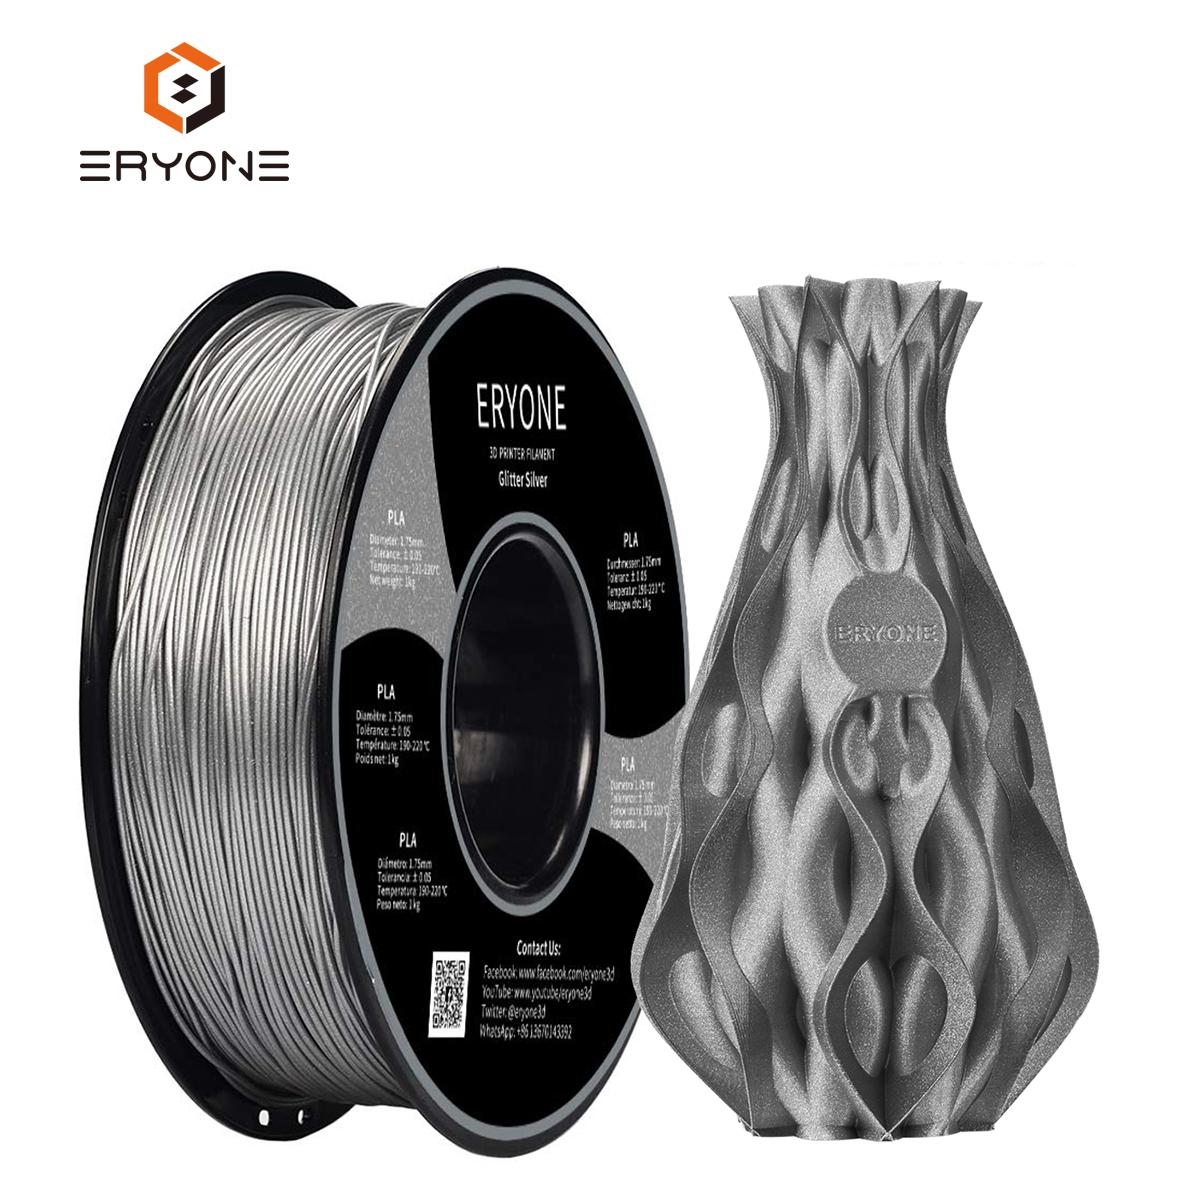 Eryone PLA Filament 1.75mm Silk Blue Silky Shiny Filament PLA Smooth Printed 3D Printer Filament 1kg/roll